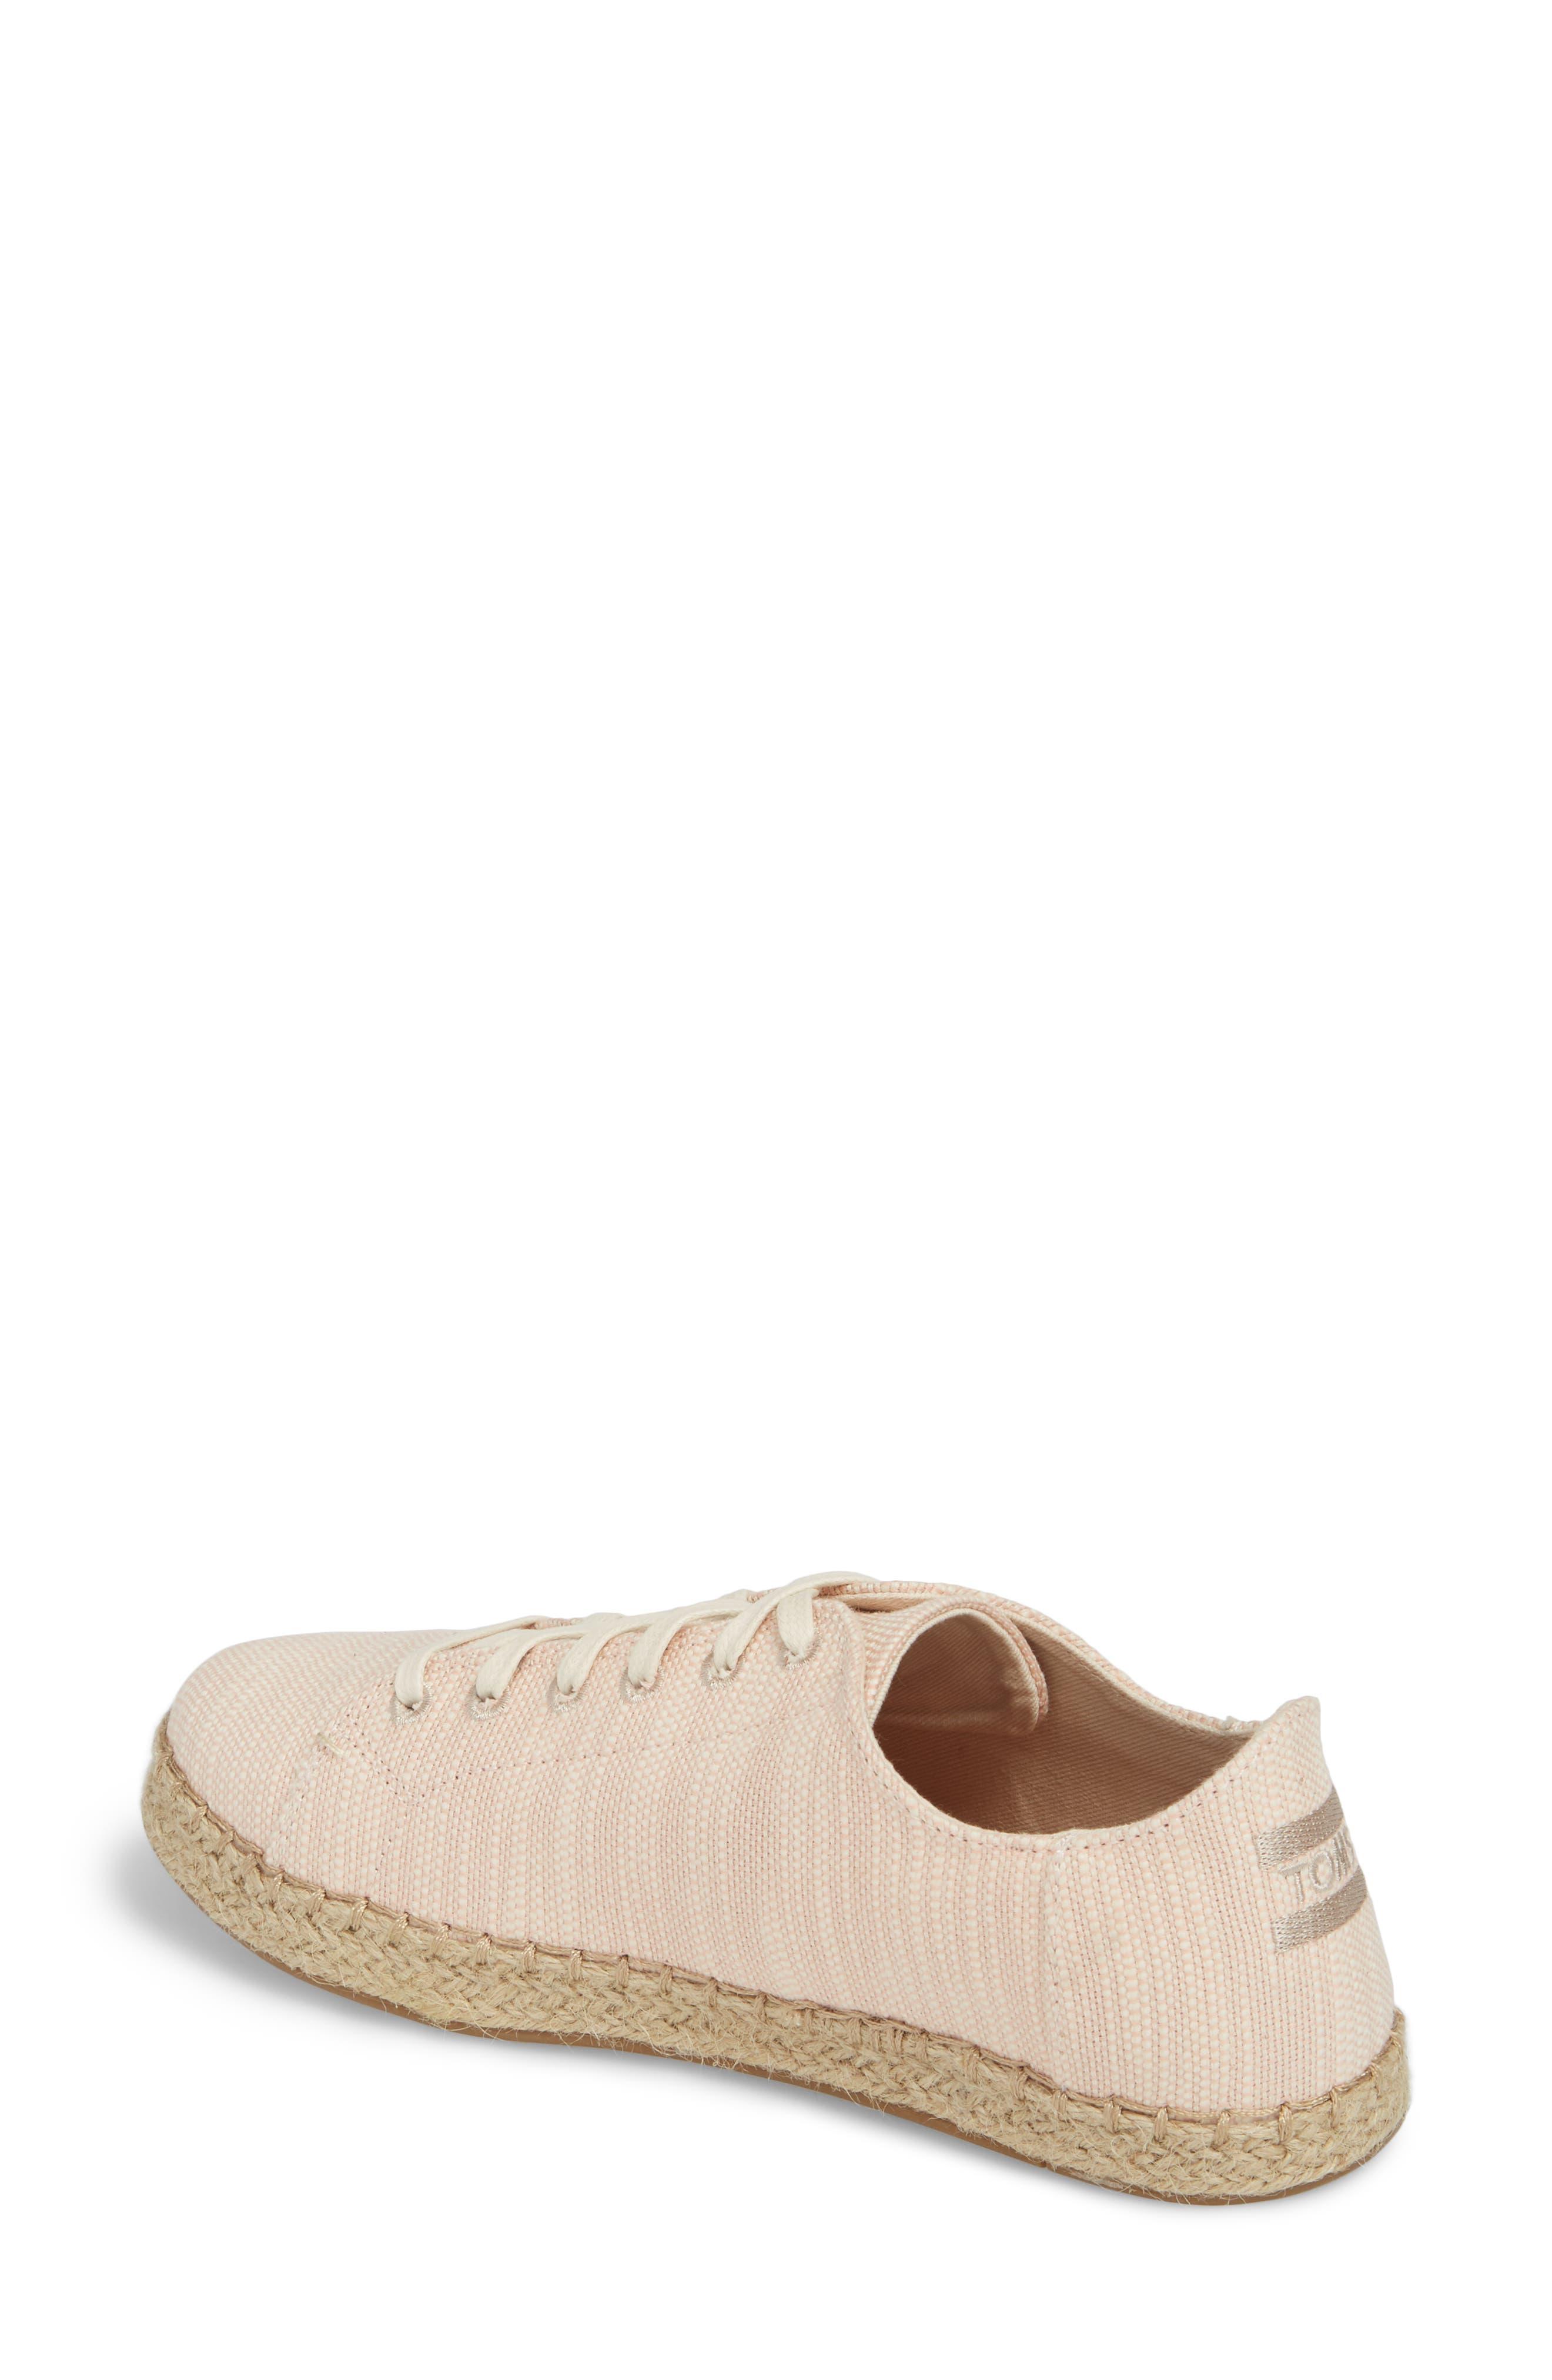 Lena Espadrille Sneaker,                             Alternate thumbnail 8, color,